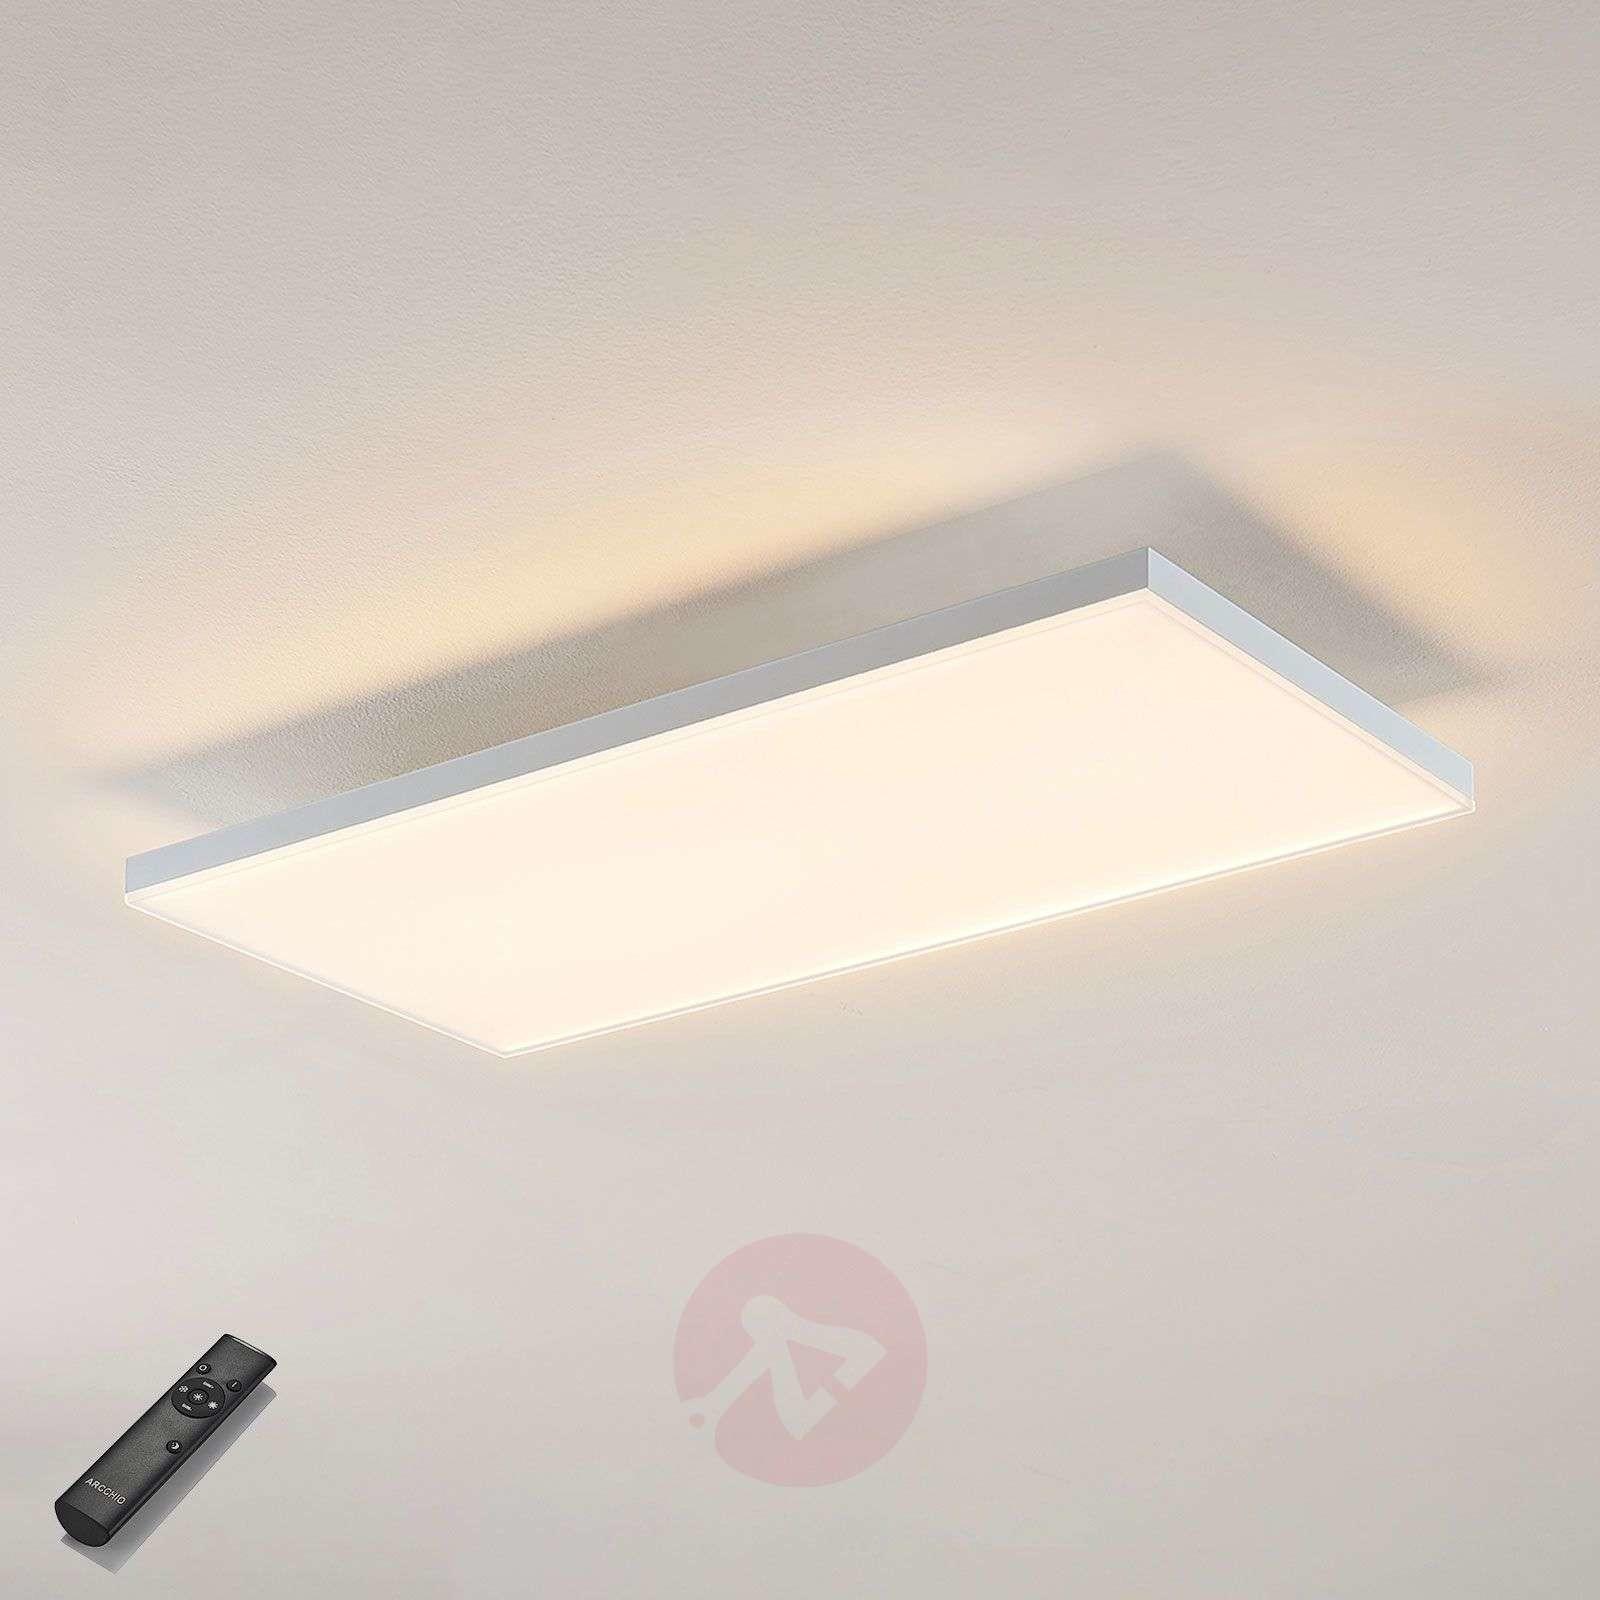 Lampenwelt com Panel LED Blaan CCT z pilotem 59,5 x 29,5 cm